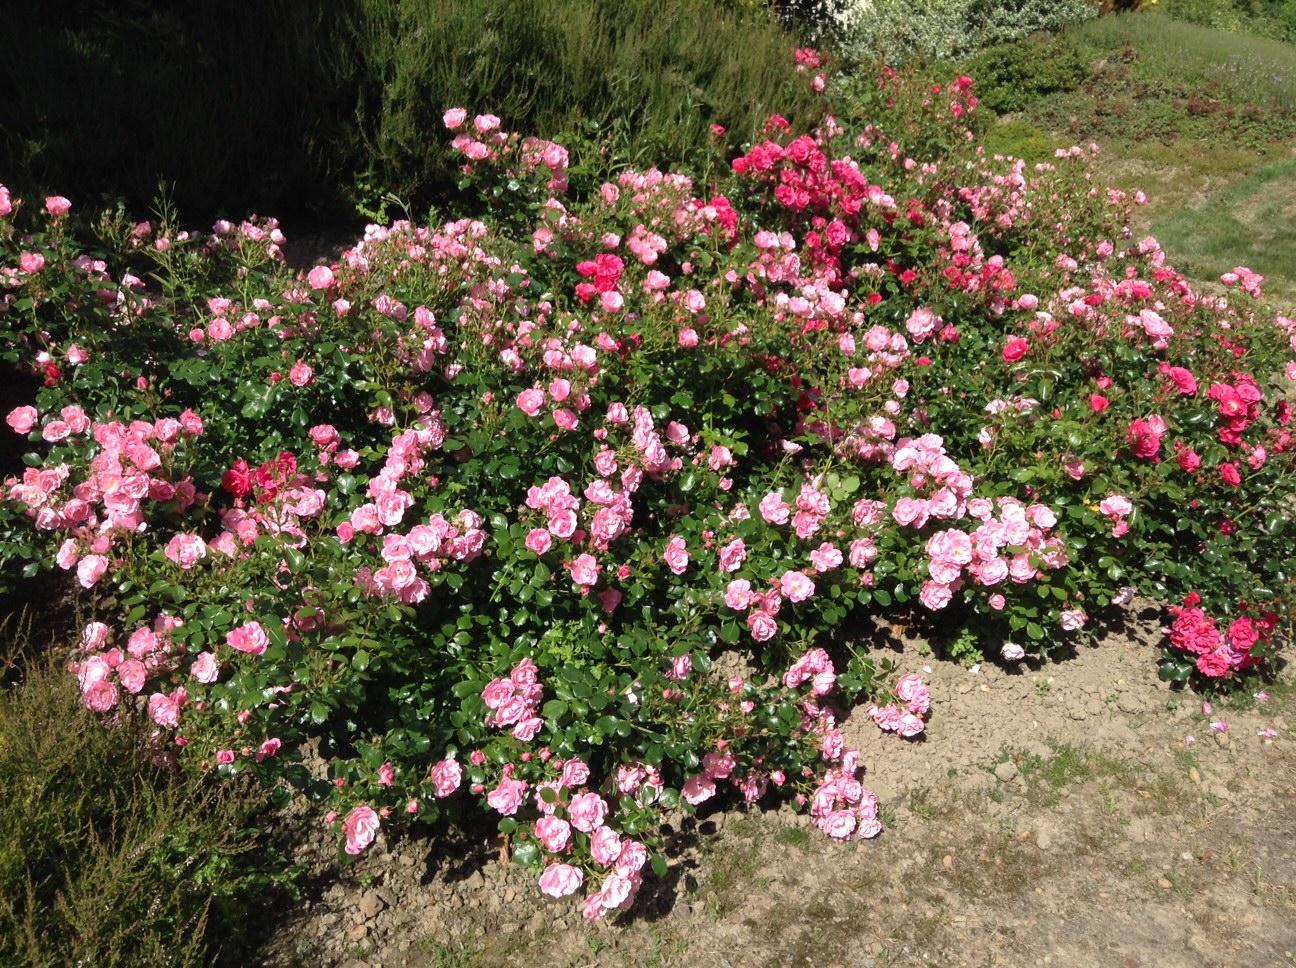 fleuriste isabelle feuvrier les rosiers couvre sol. Black Bedroom Furniture Sets. Home Design Ideas